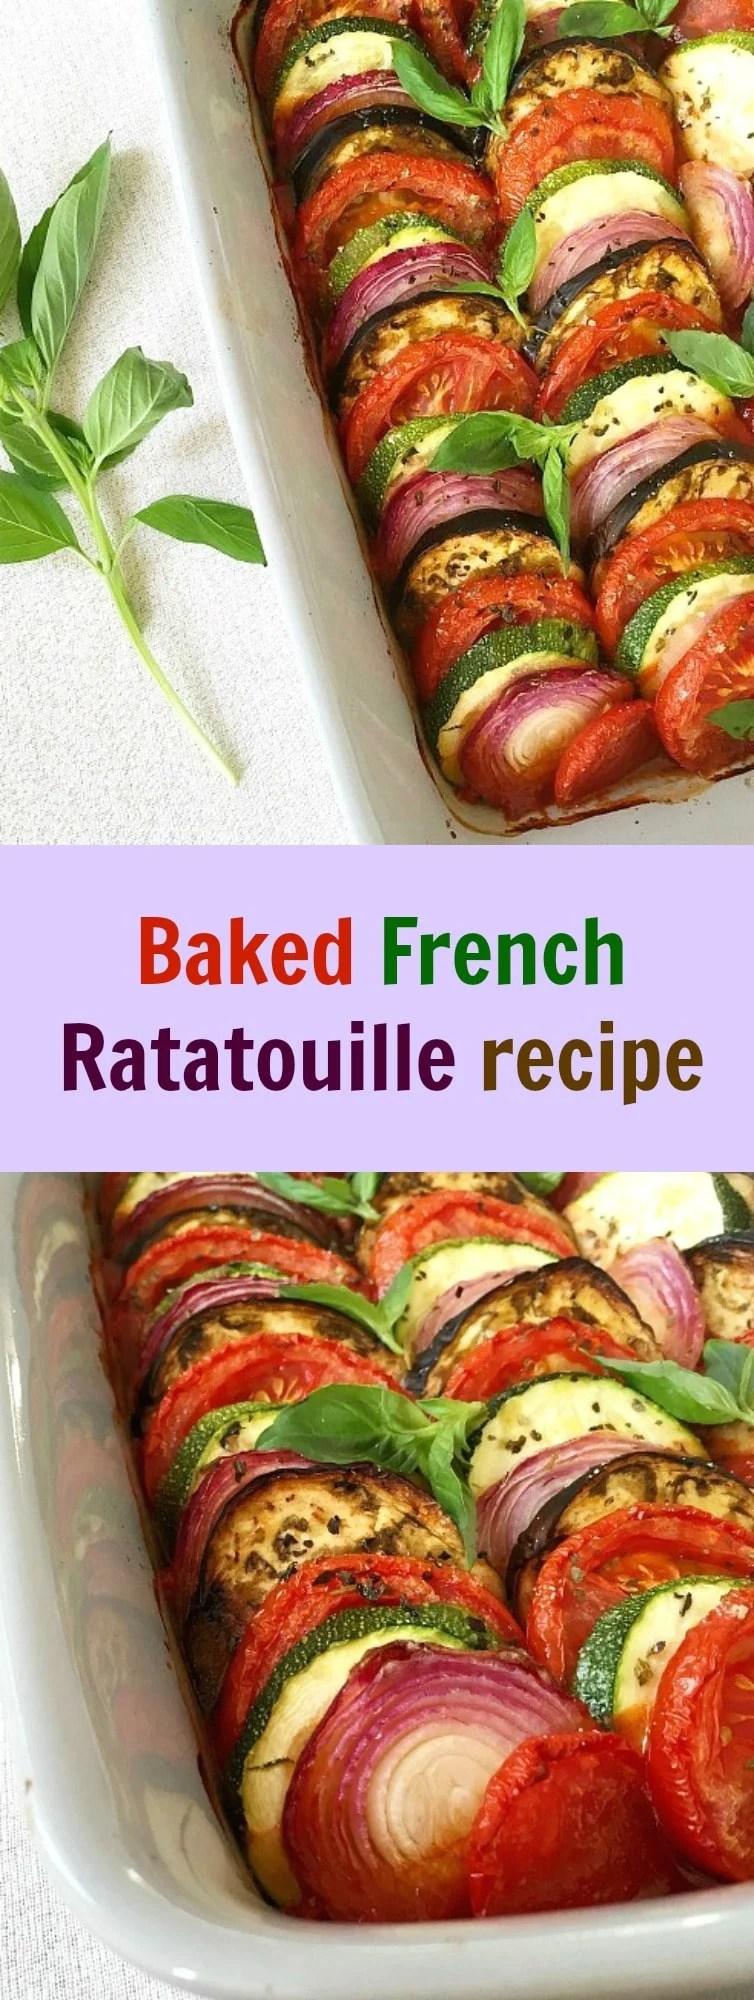 Baked French Ratatouille recipe